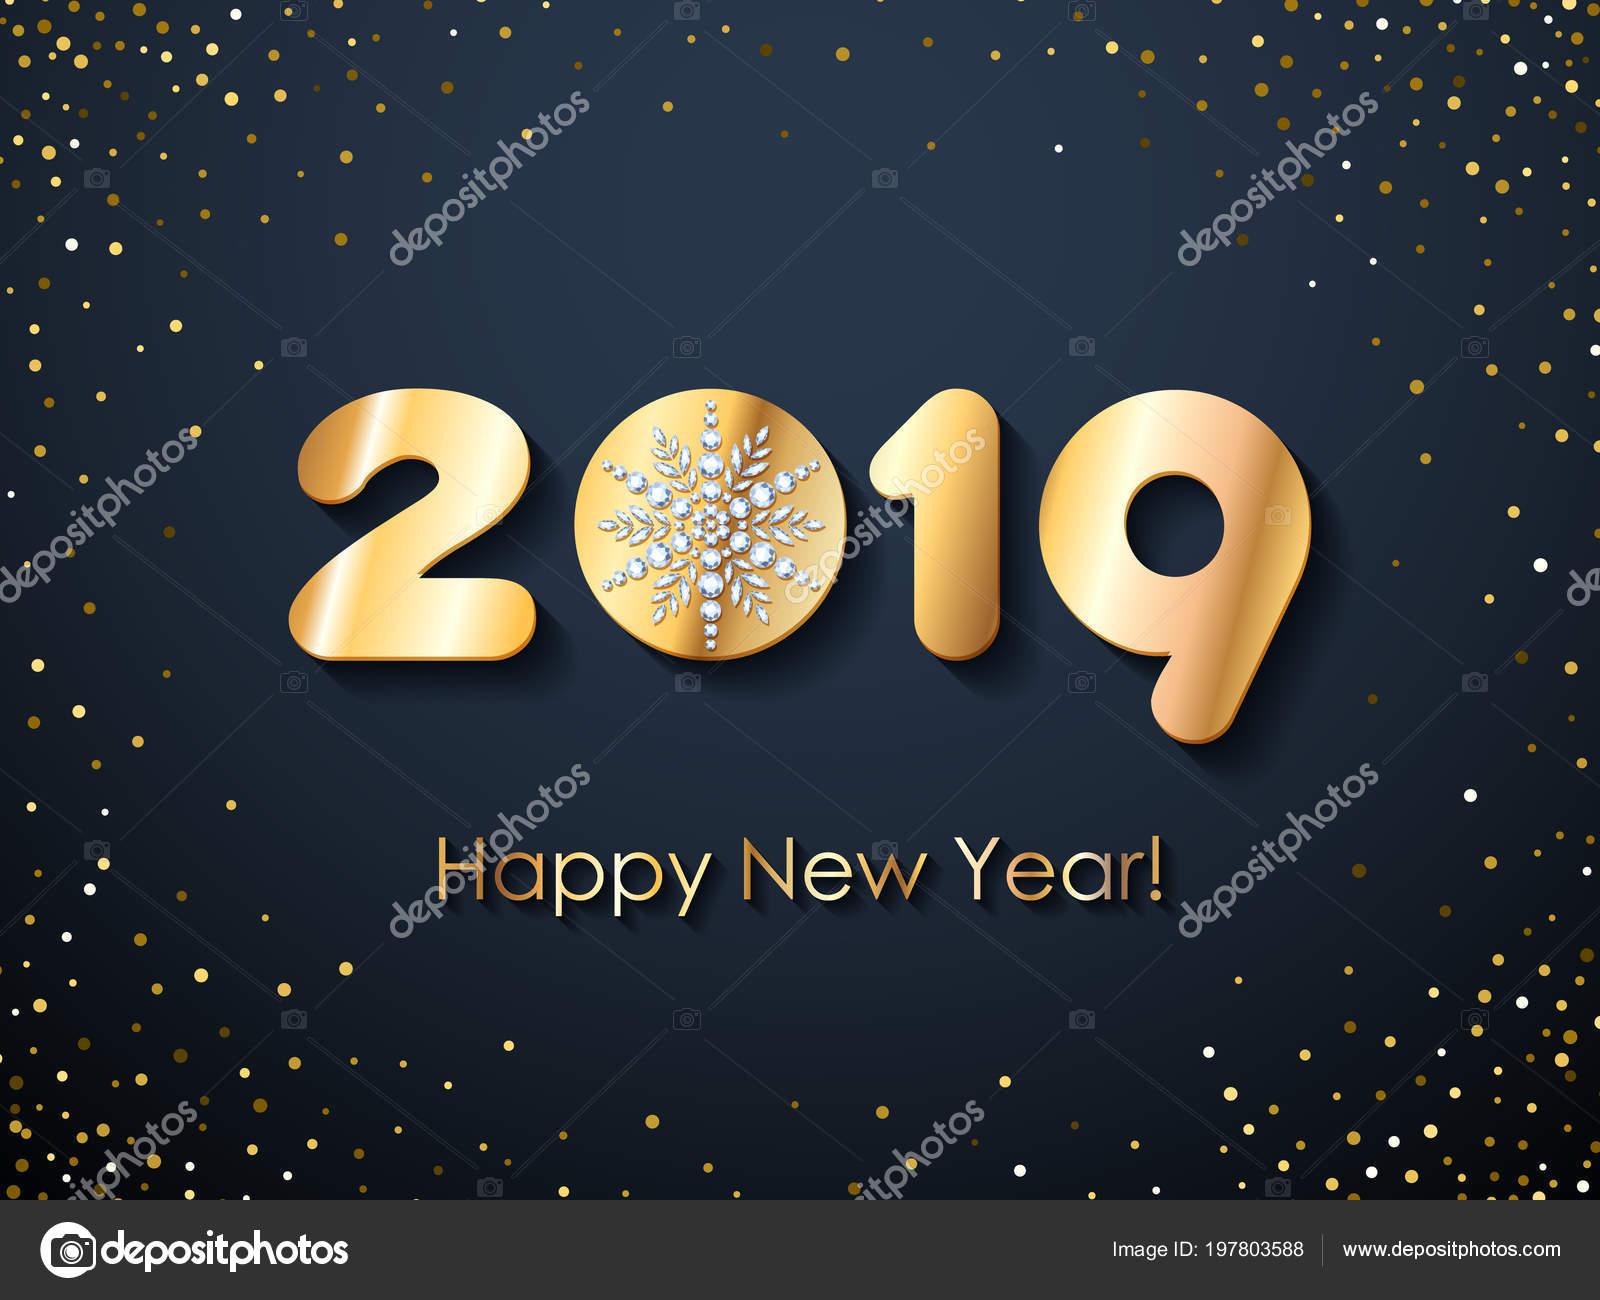 depositphotos_197803588 stock illustration 2019 happy new year background jpg